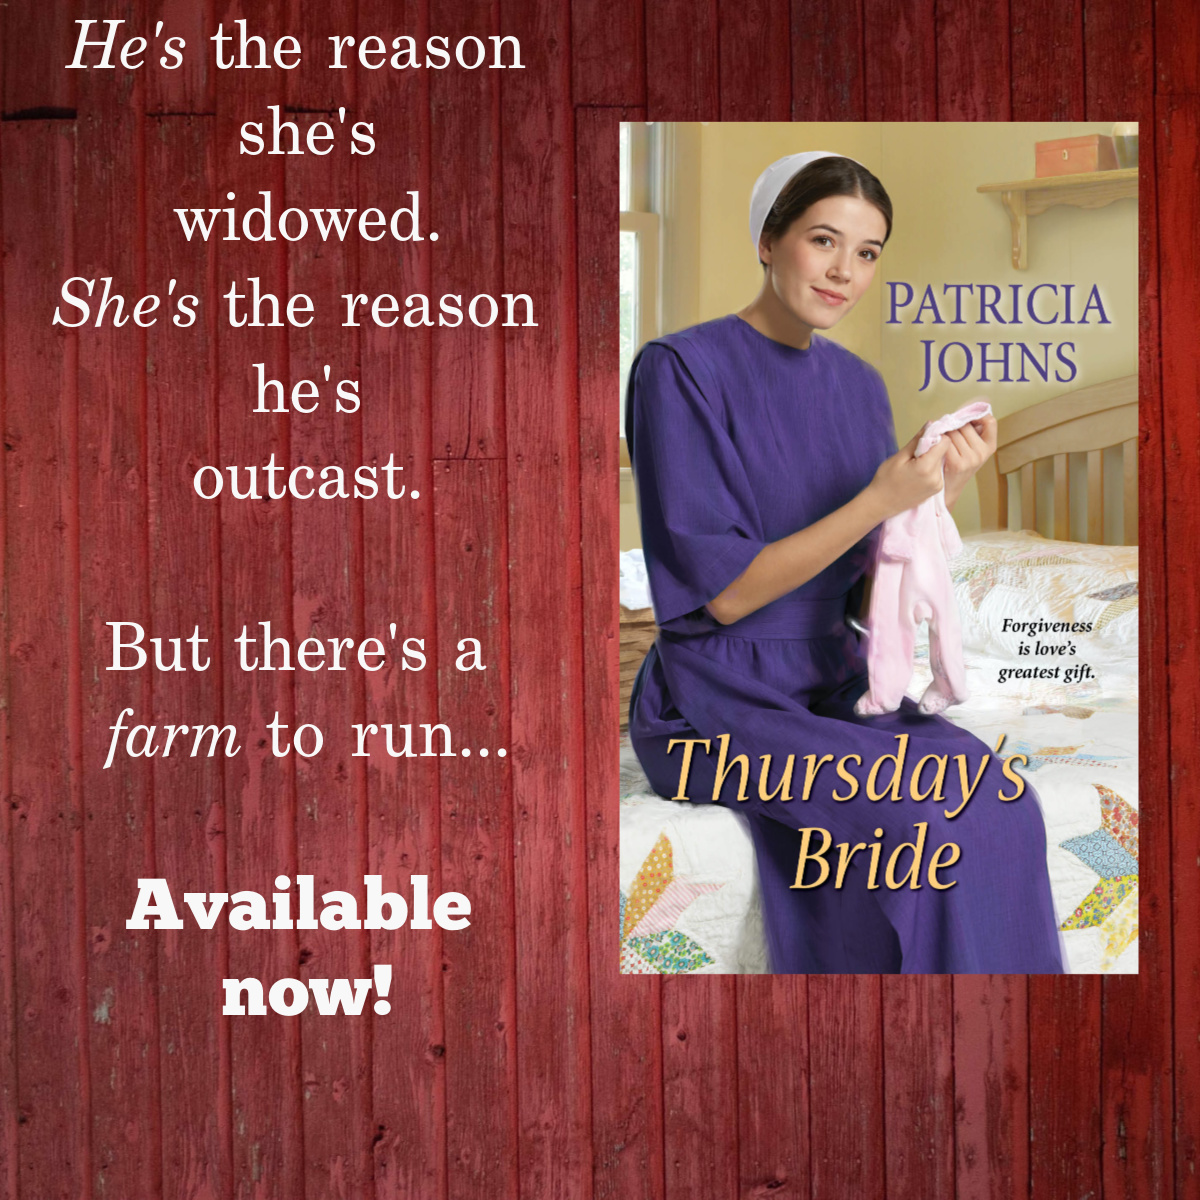 Thursday's Bride 3